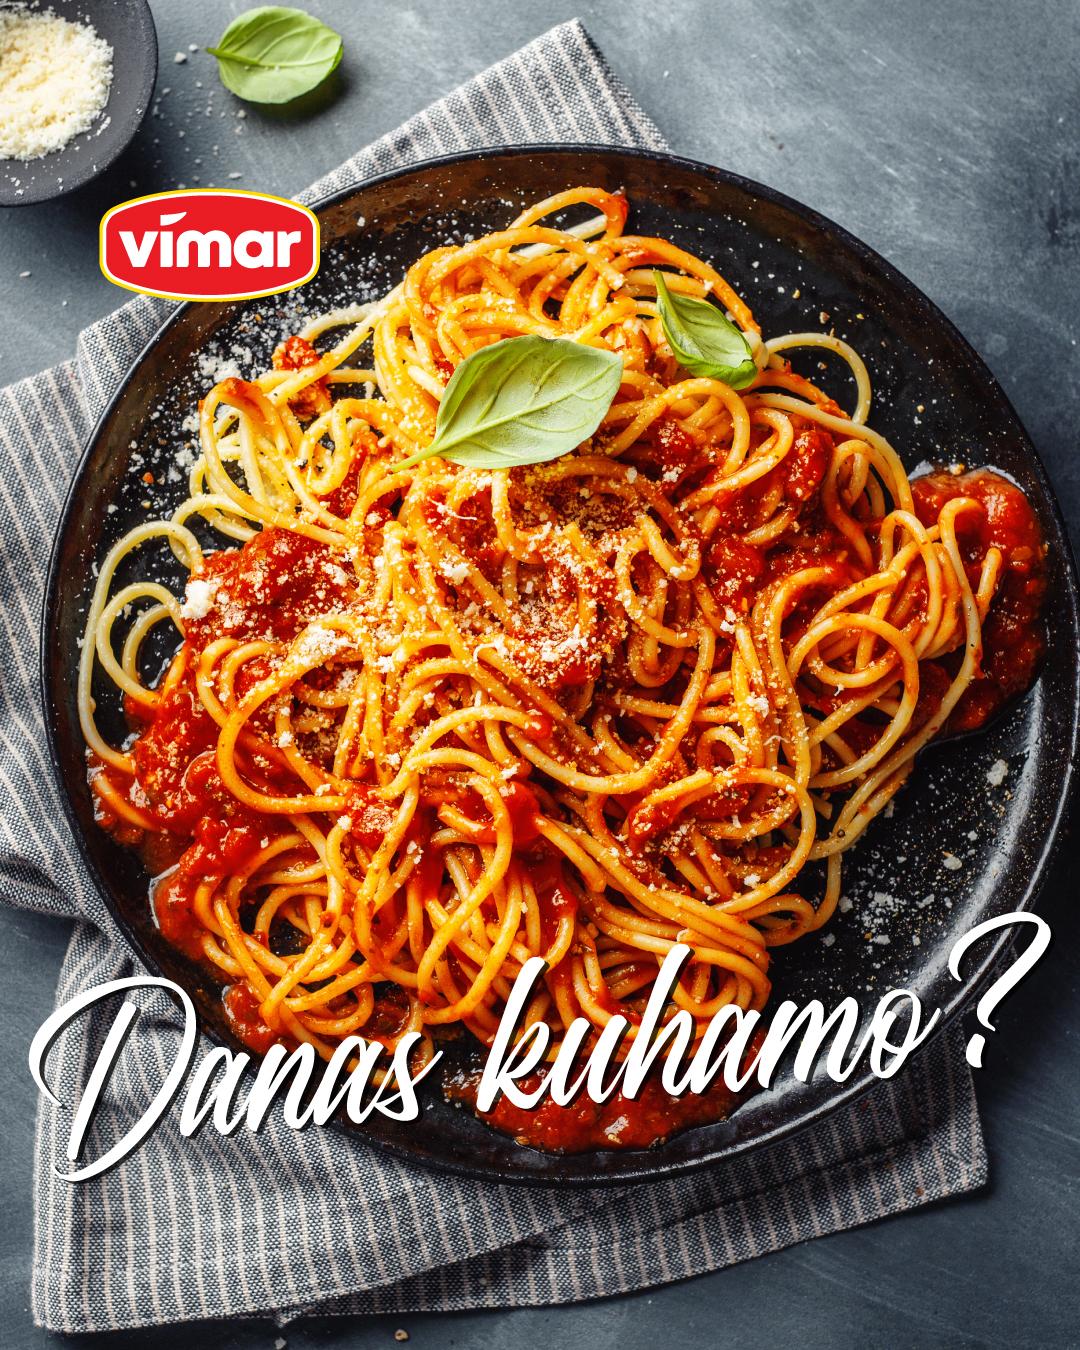 Spaghetti s Bolognese umakom.